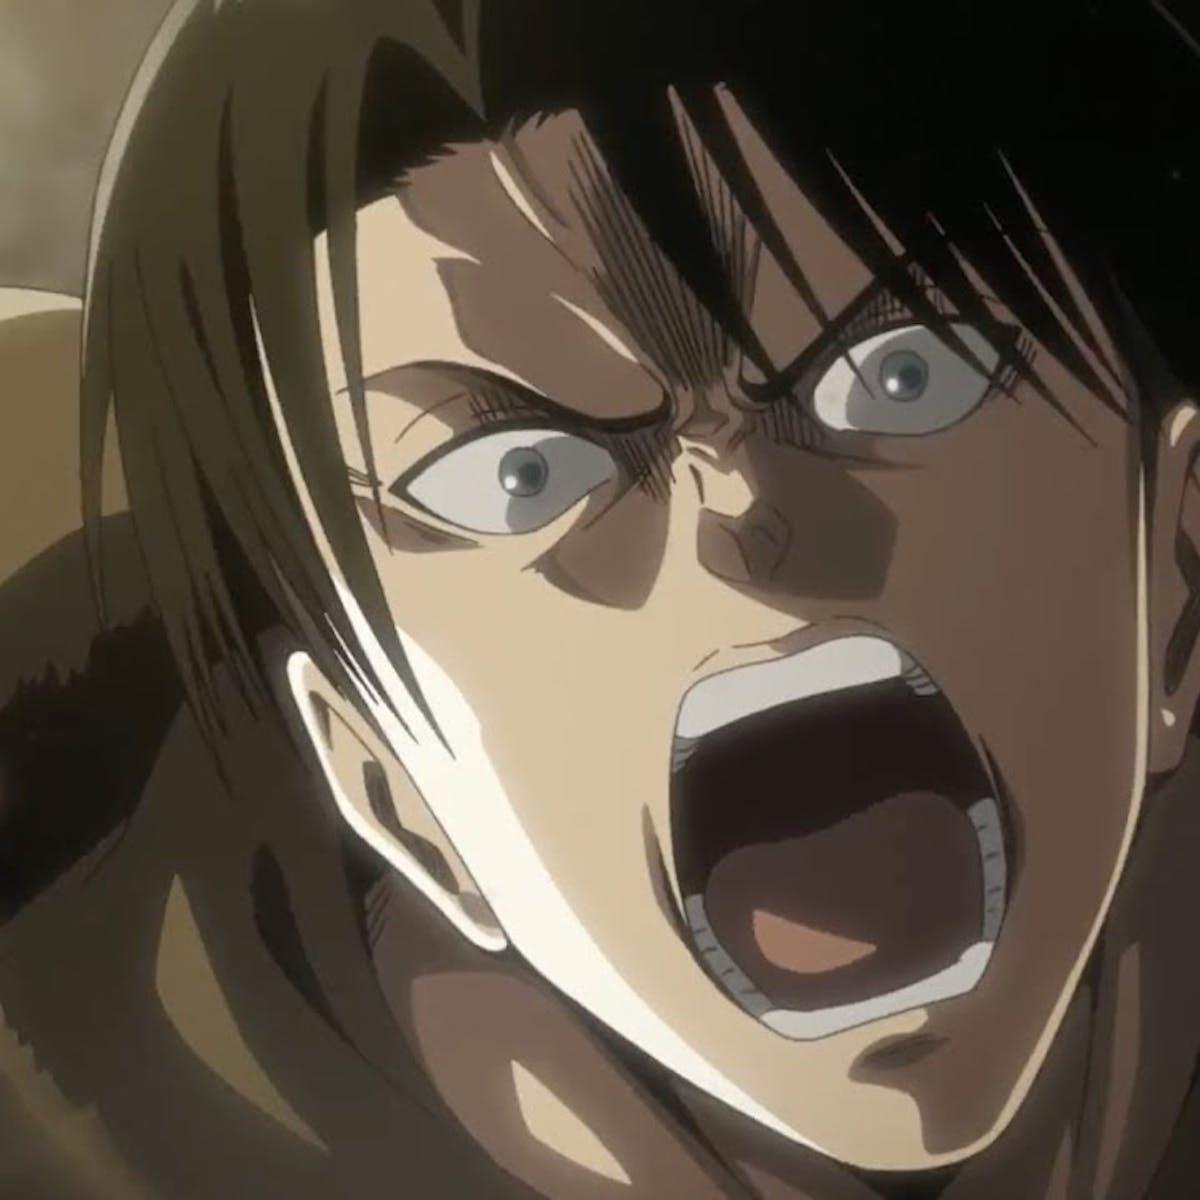 Attack On Titan Season 3 Episode 1 Recap It Starts With A Murder